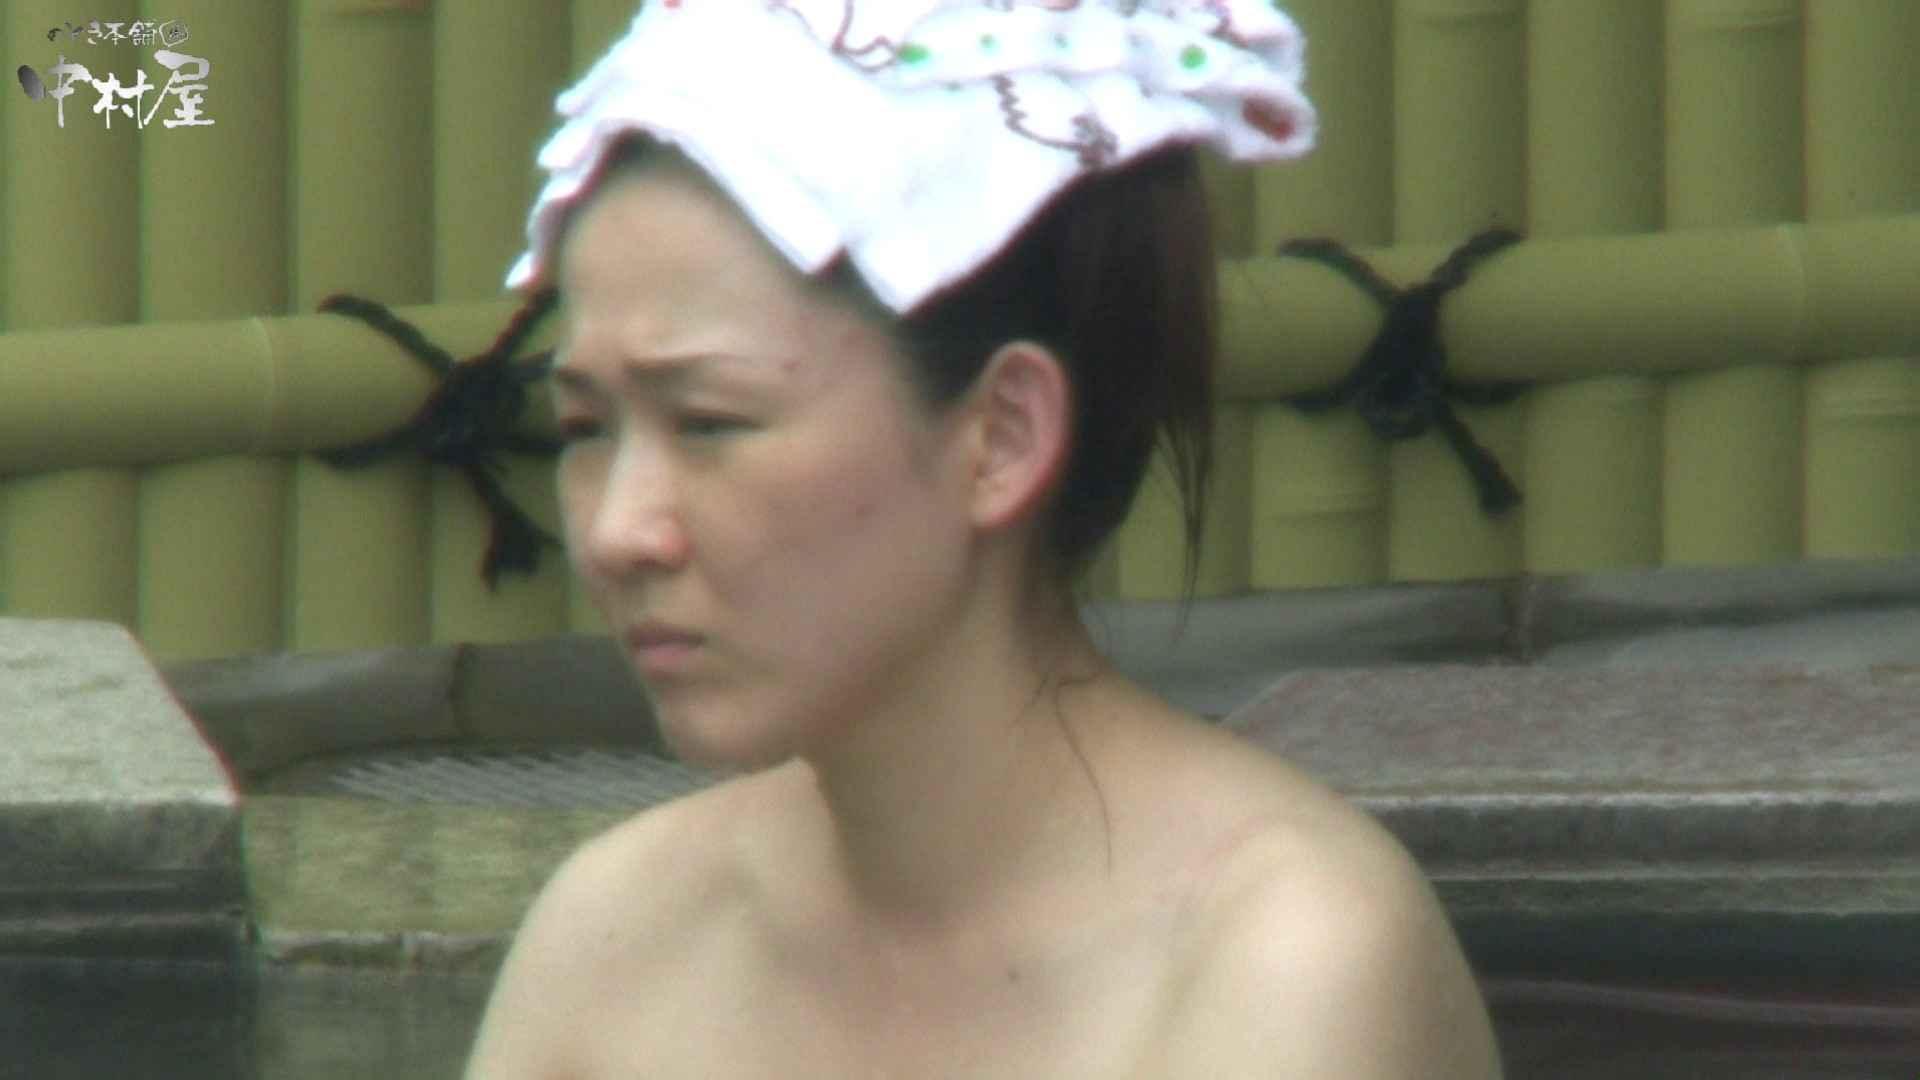 Aquaな露天風呂Vol.943 0 | 0  9連発 3